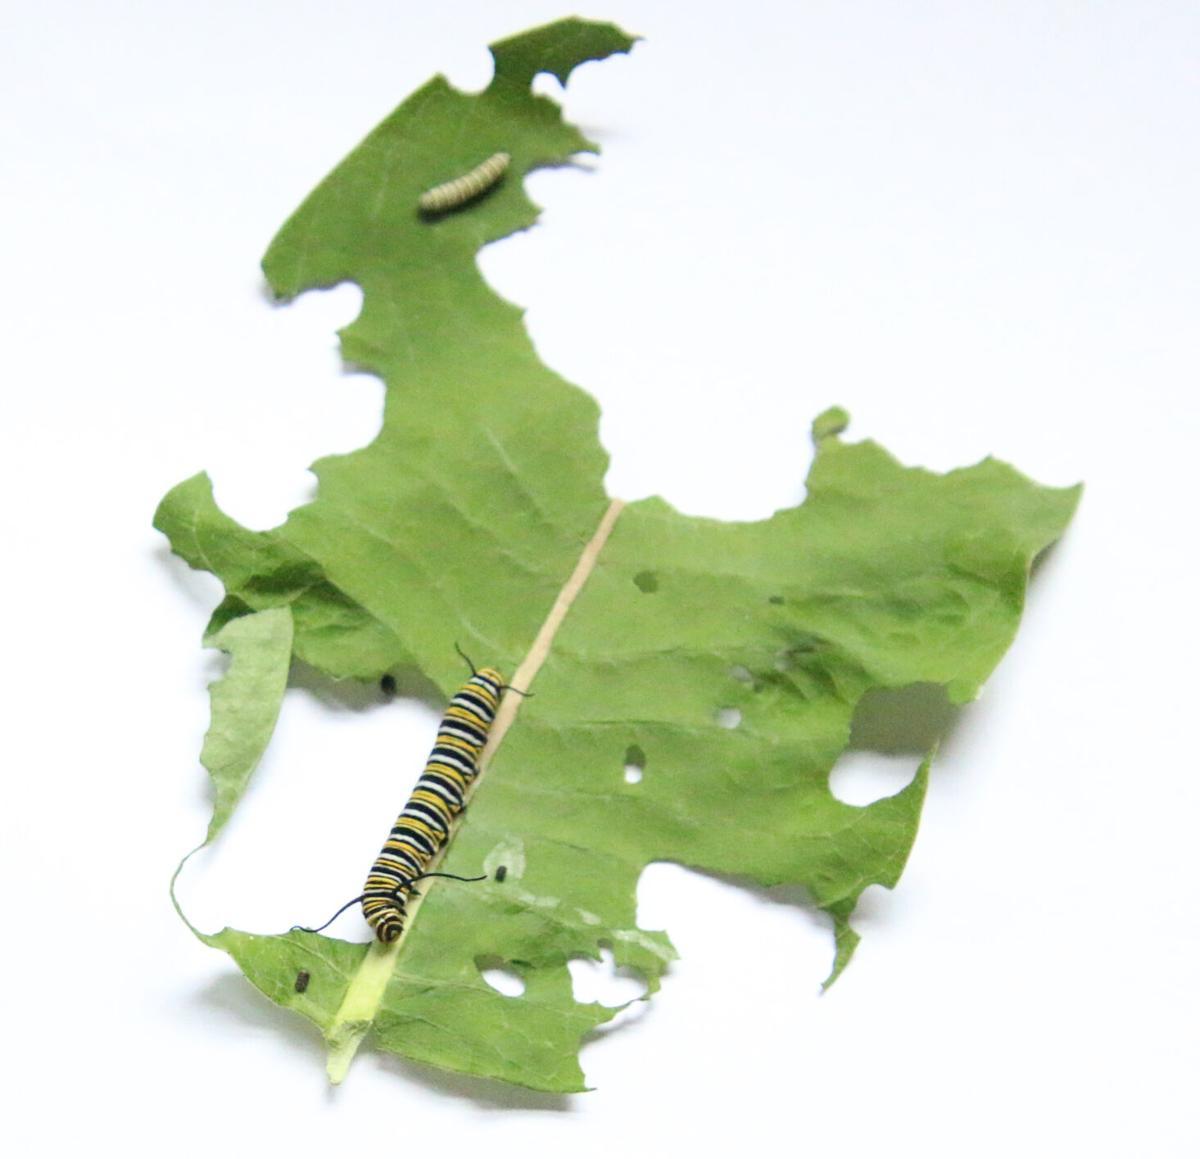 Caterpillars eating milkweed